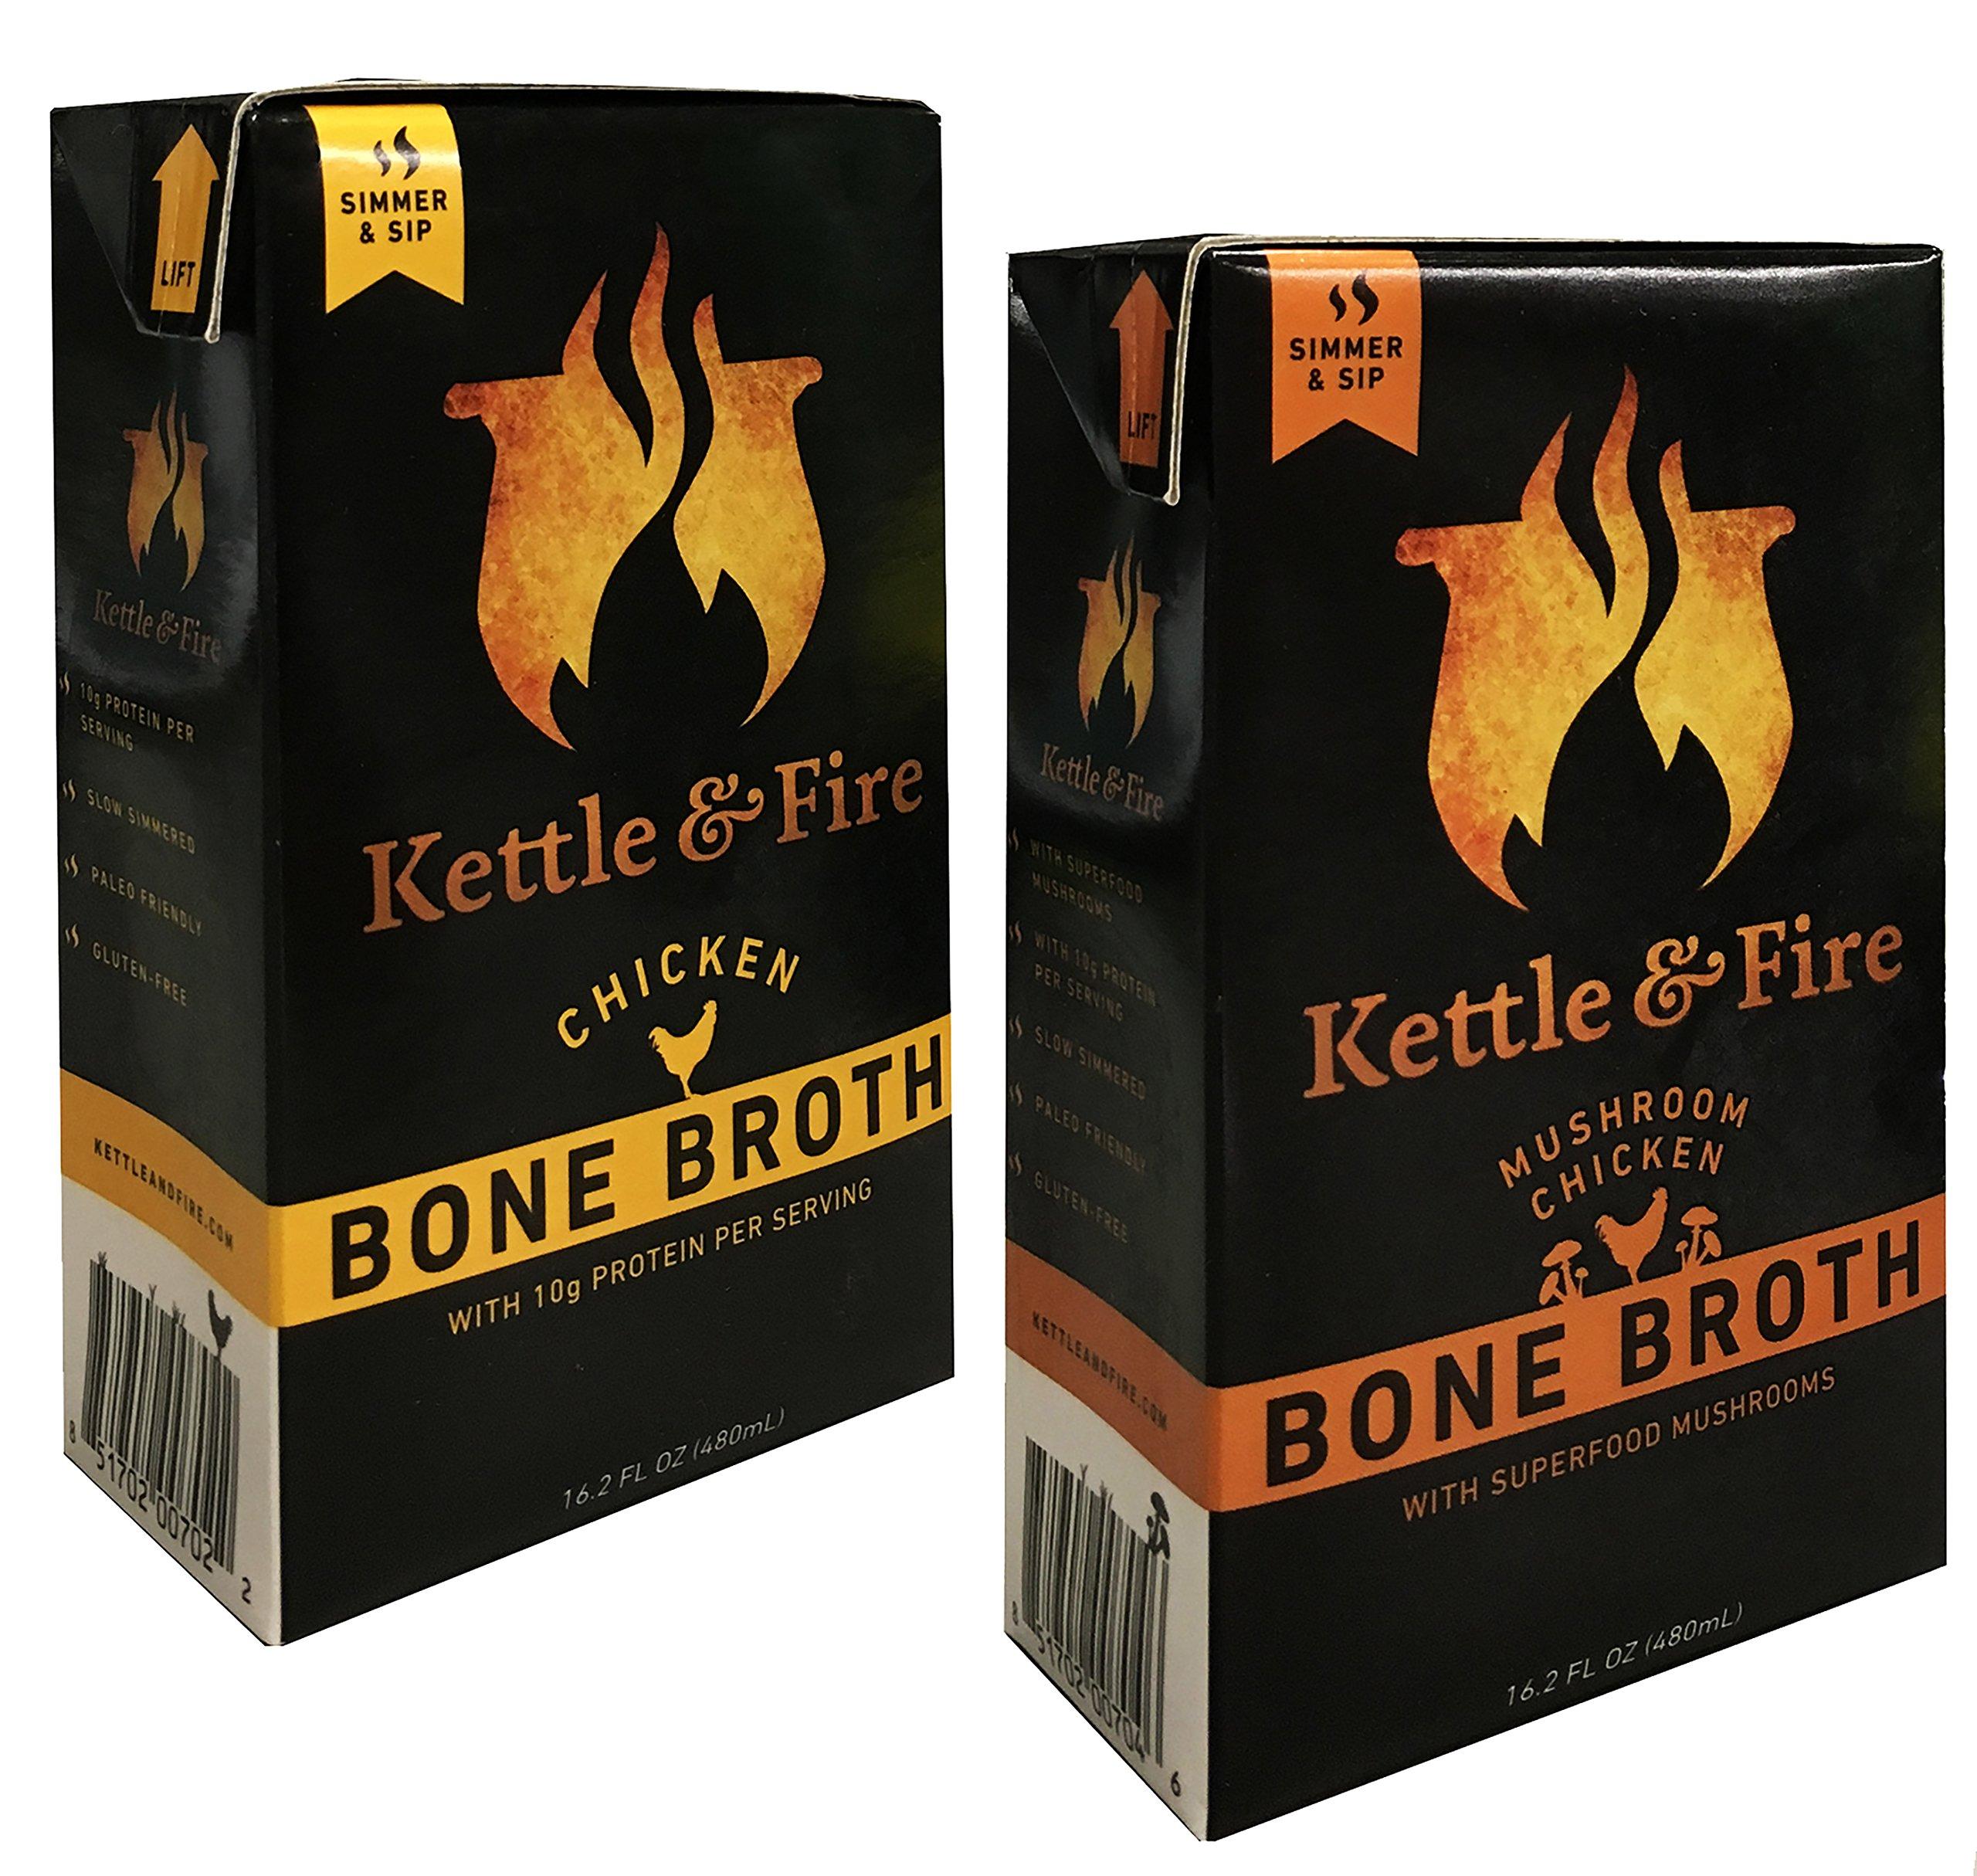 """Kettle & Fire Chicken Bone Broth and Mushroom Chicken Bone Broth Pack of 2 16.2 FL OZ"